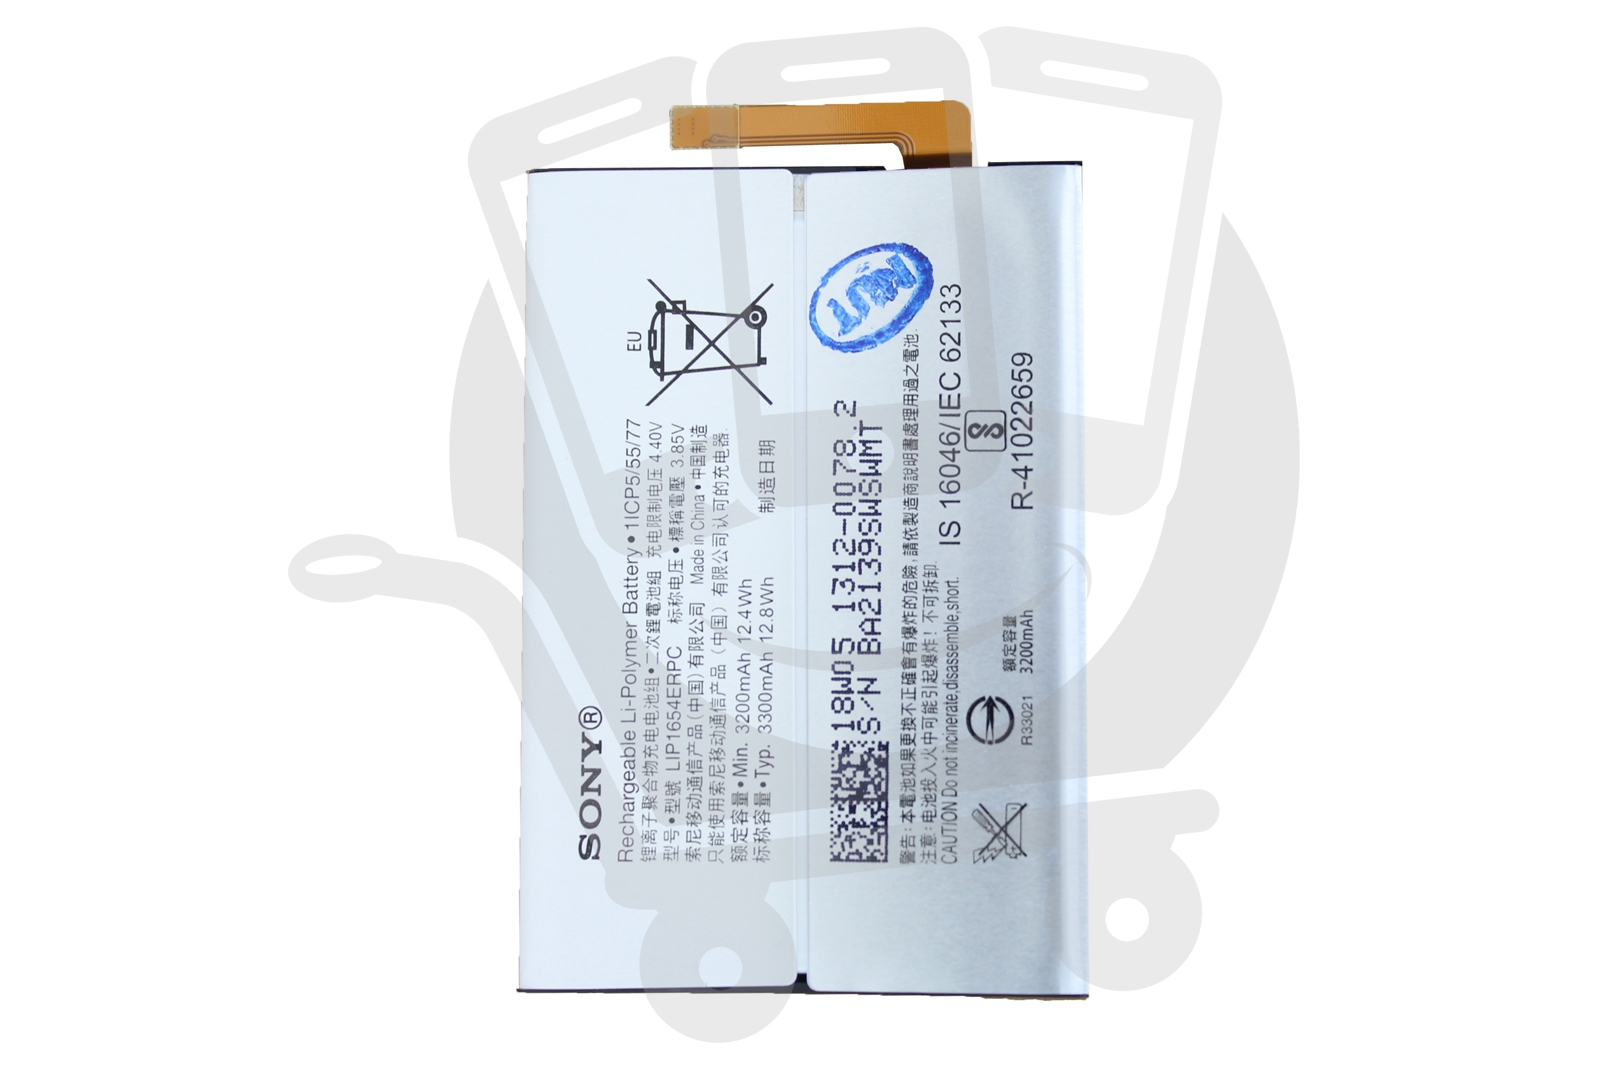 Genuine Sony Xperia L2 L3 3300mah Battery 1312 0078 U50058032 5056176928919 Ebay